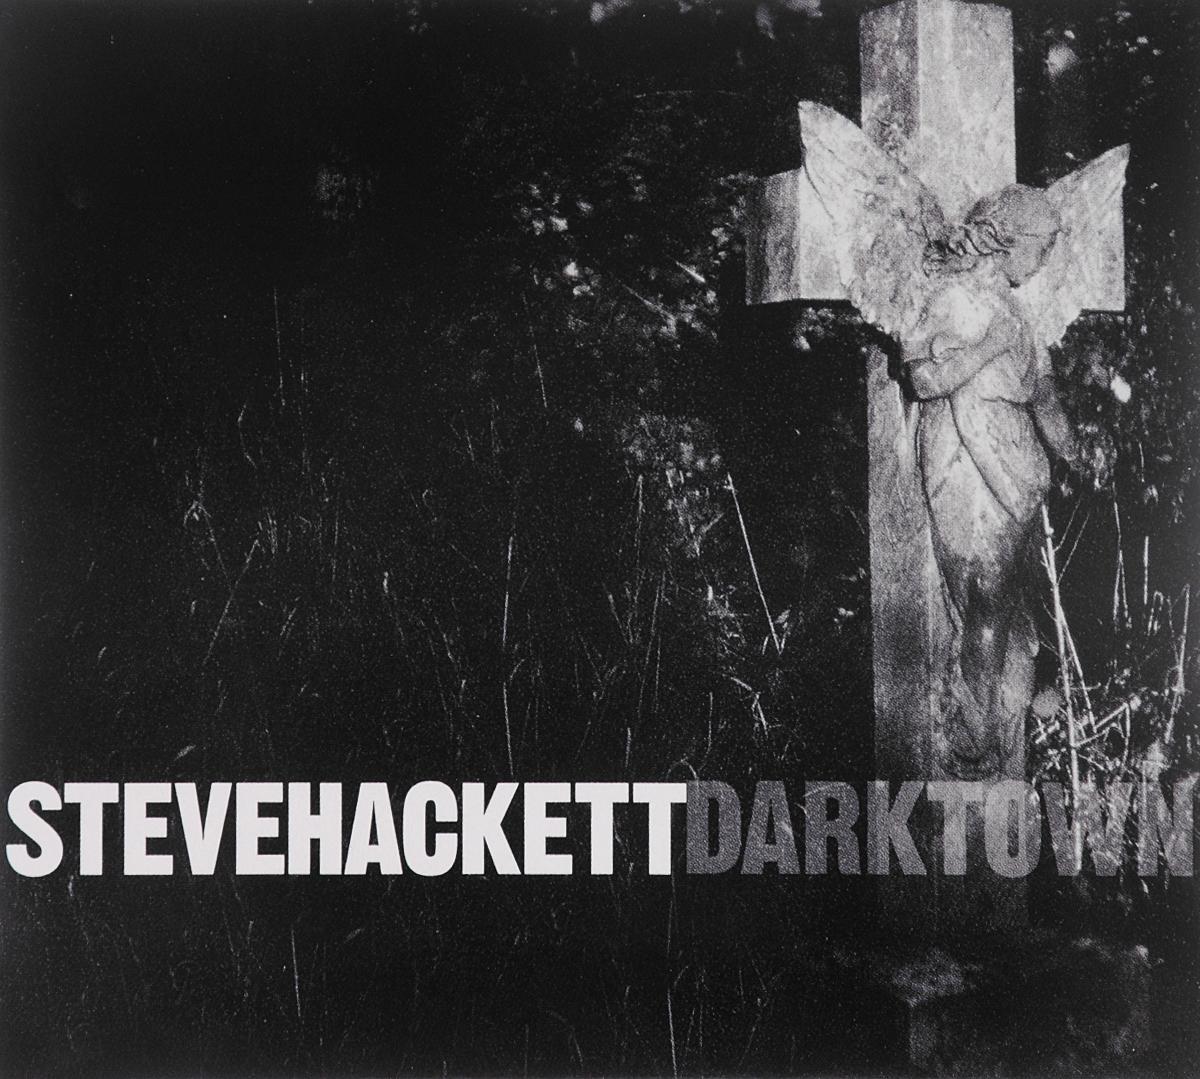 Стив Хэкетт Steve Hackett. Darktown steve hackett steve hackett live at the new theatre oxford 1979 2 lp